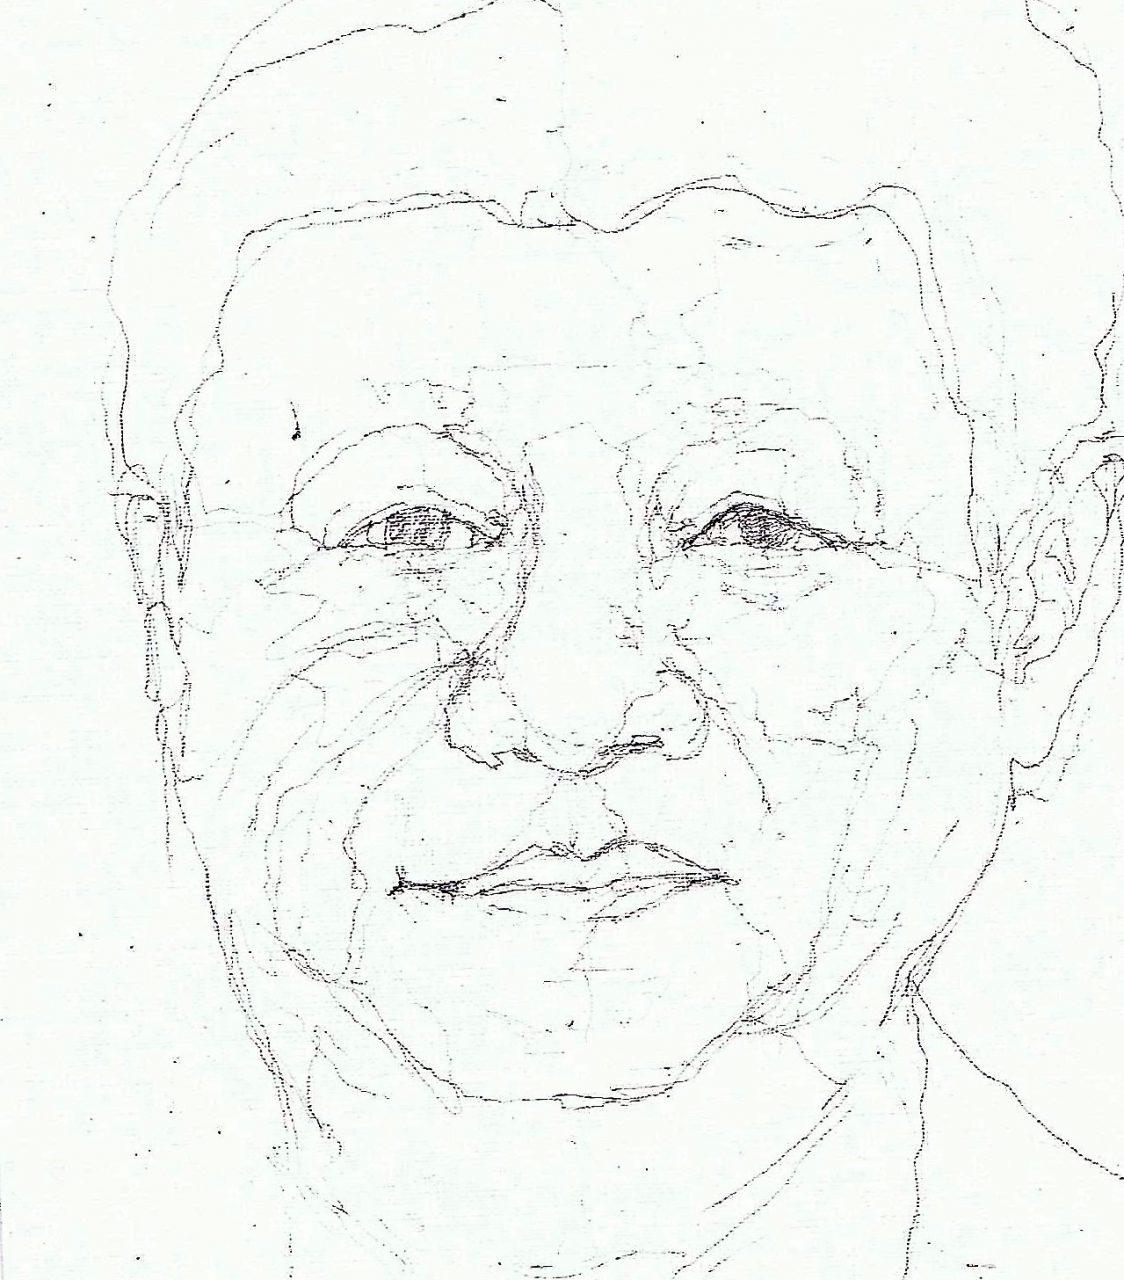 365 dagen een portret Xi Linping , president China Tekening 19c25